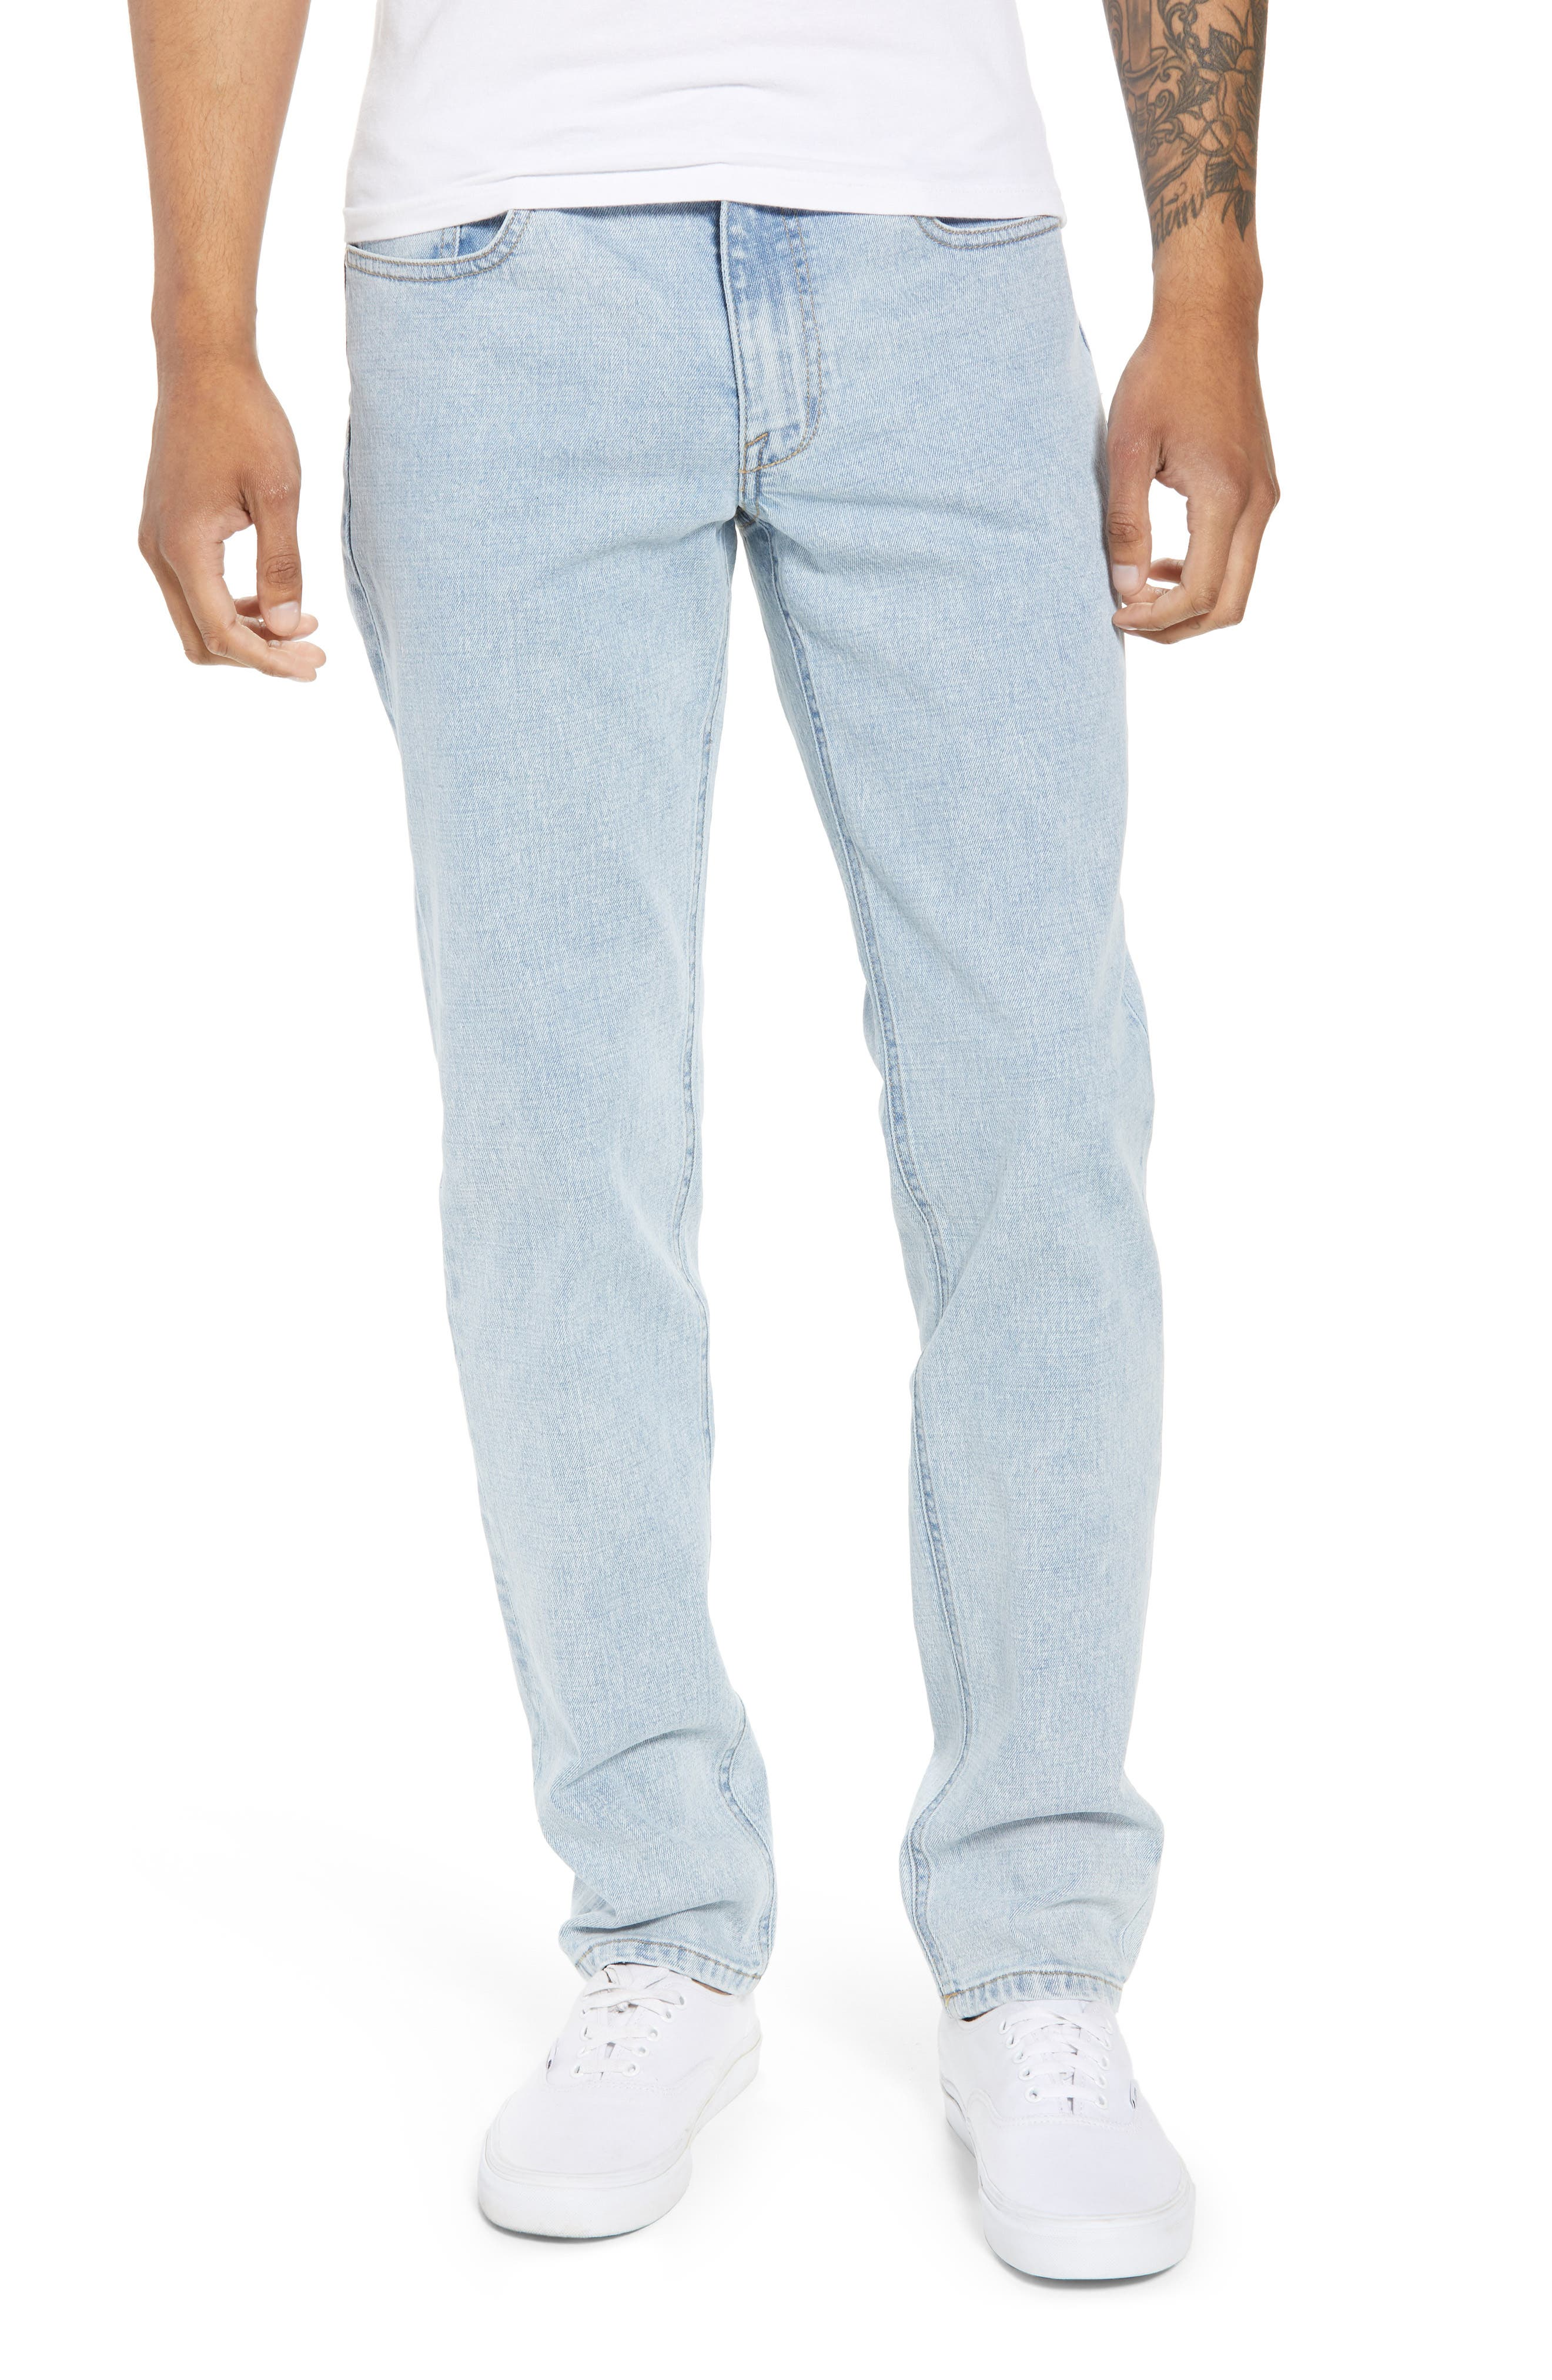 Acid Wash Stretch Slim Leg Jeans,                             Main thumbnail 1, color,                             BLUE VEDDER WASH